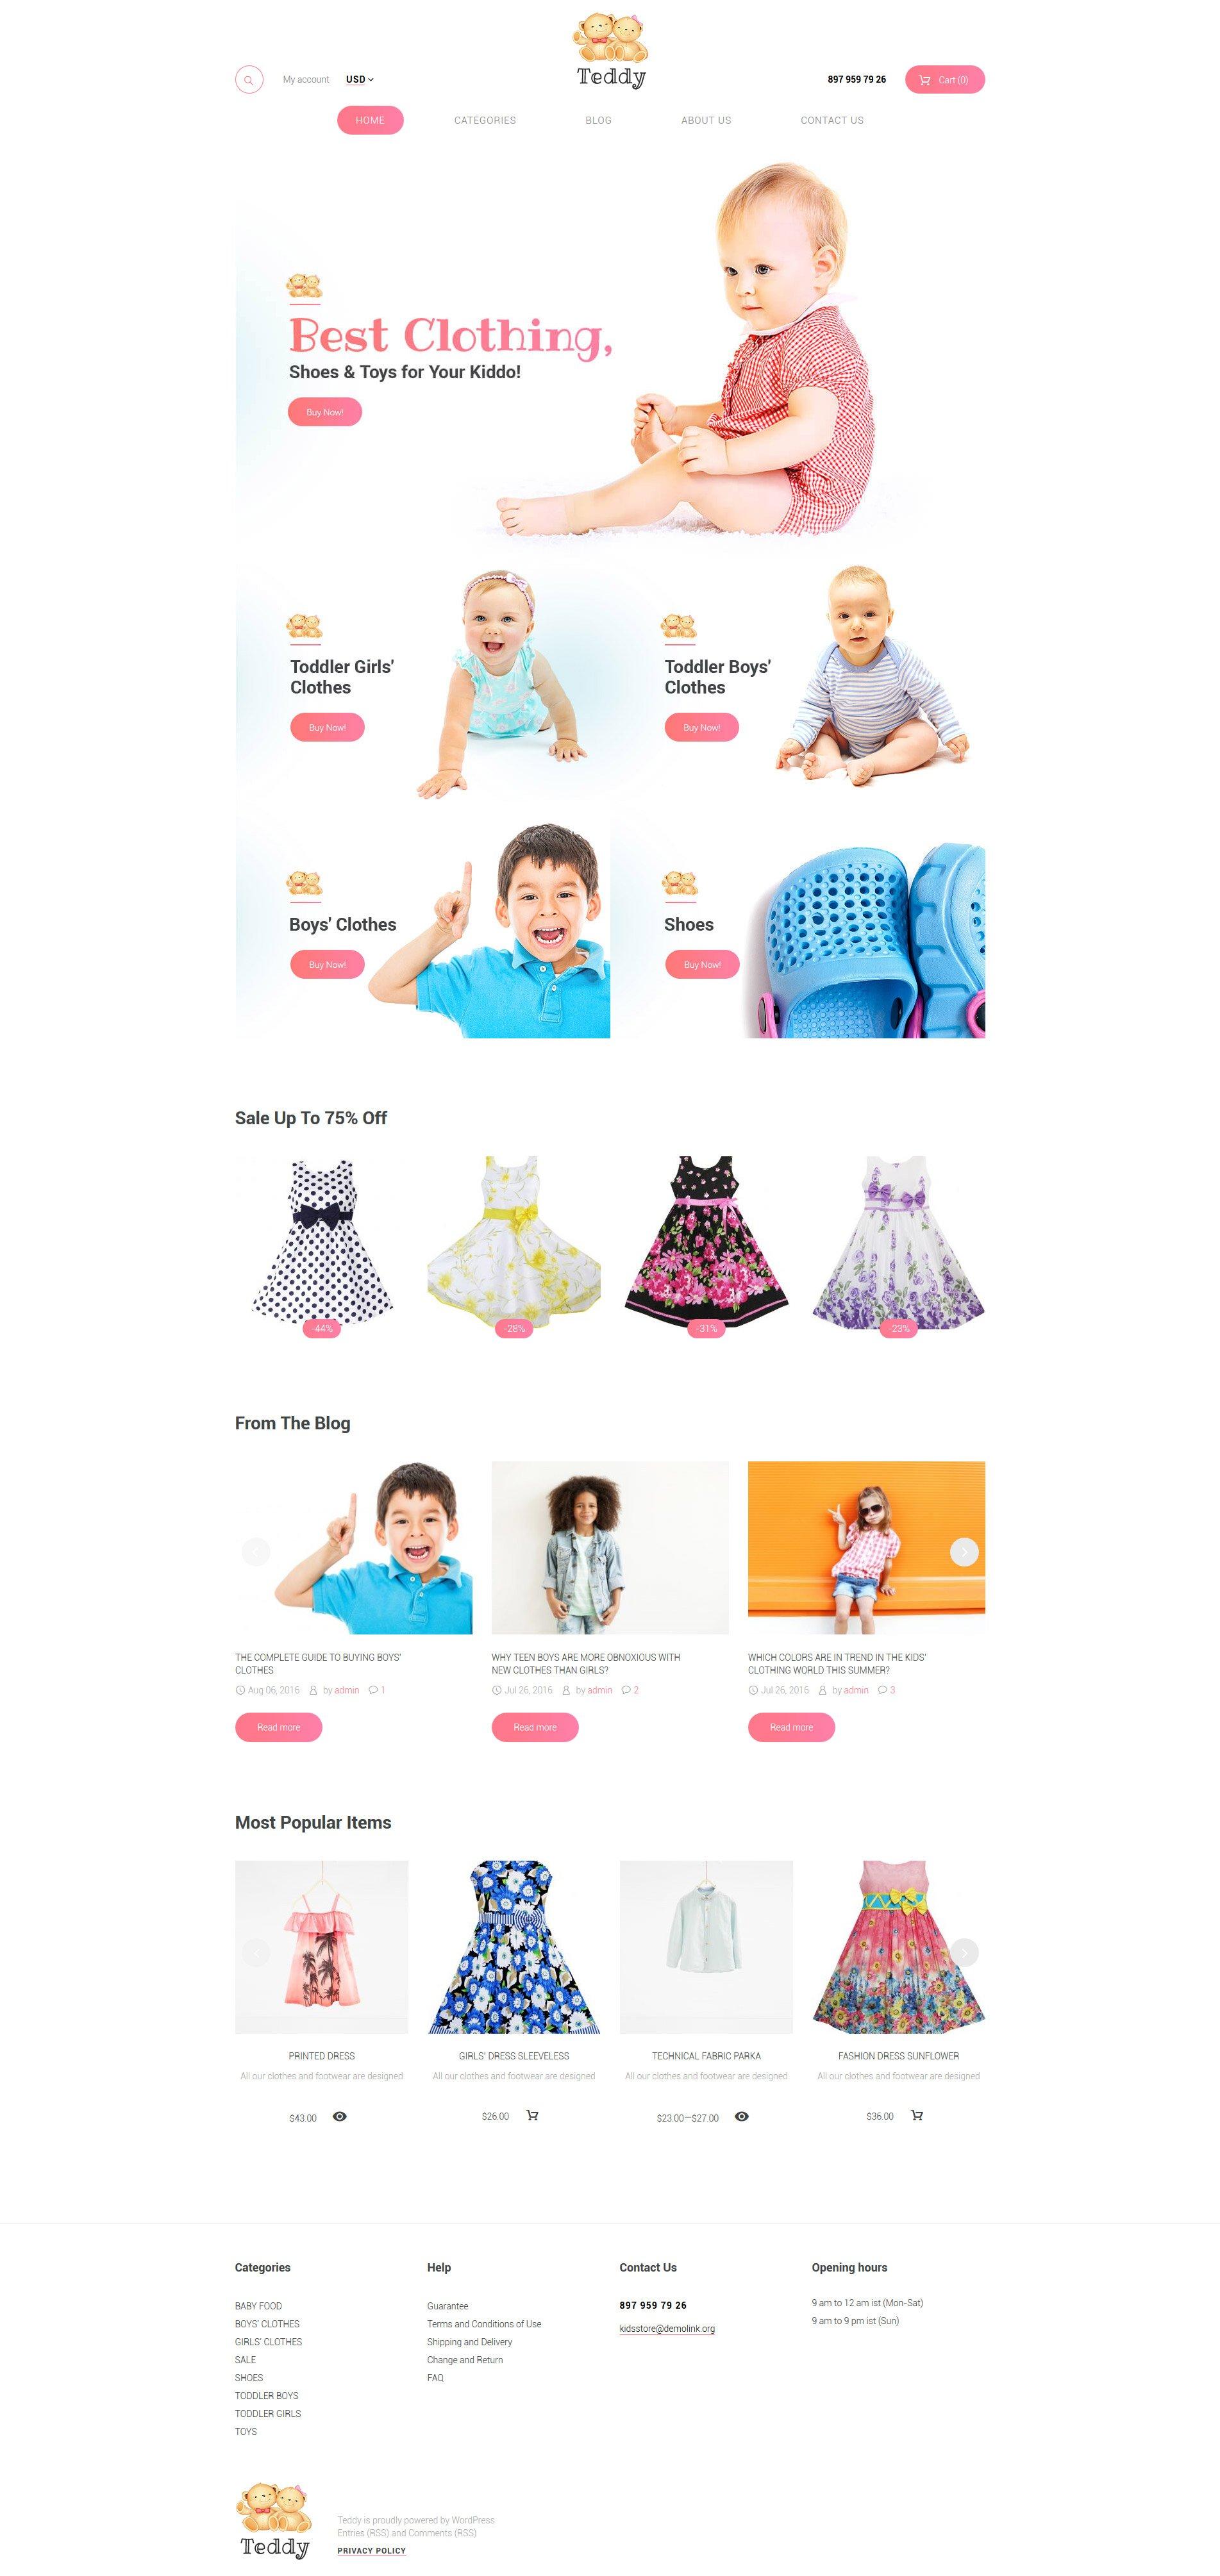 Teddy - Kids Shop №59044 - скриншот